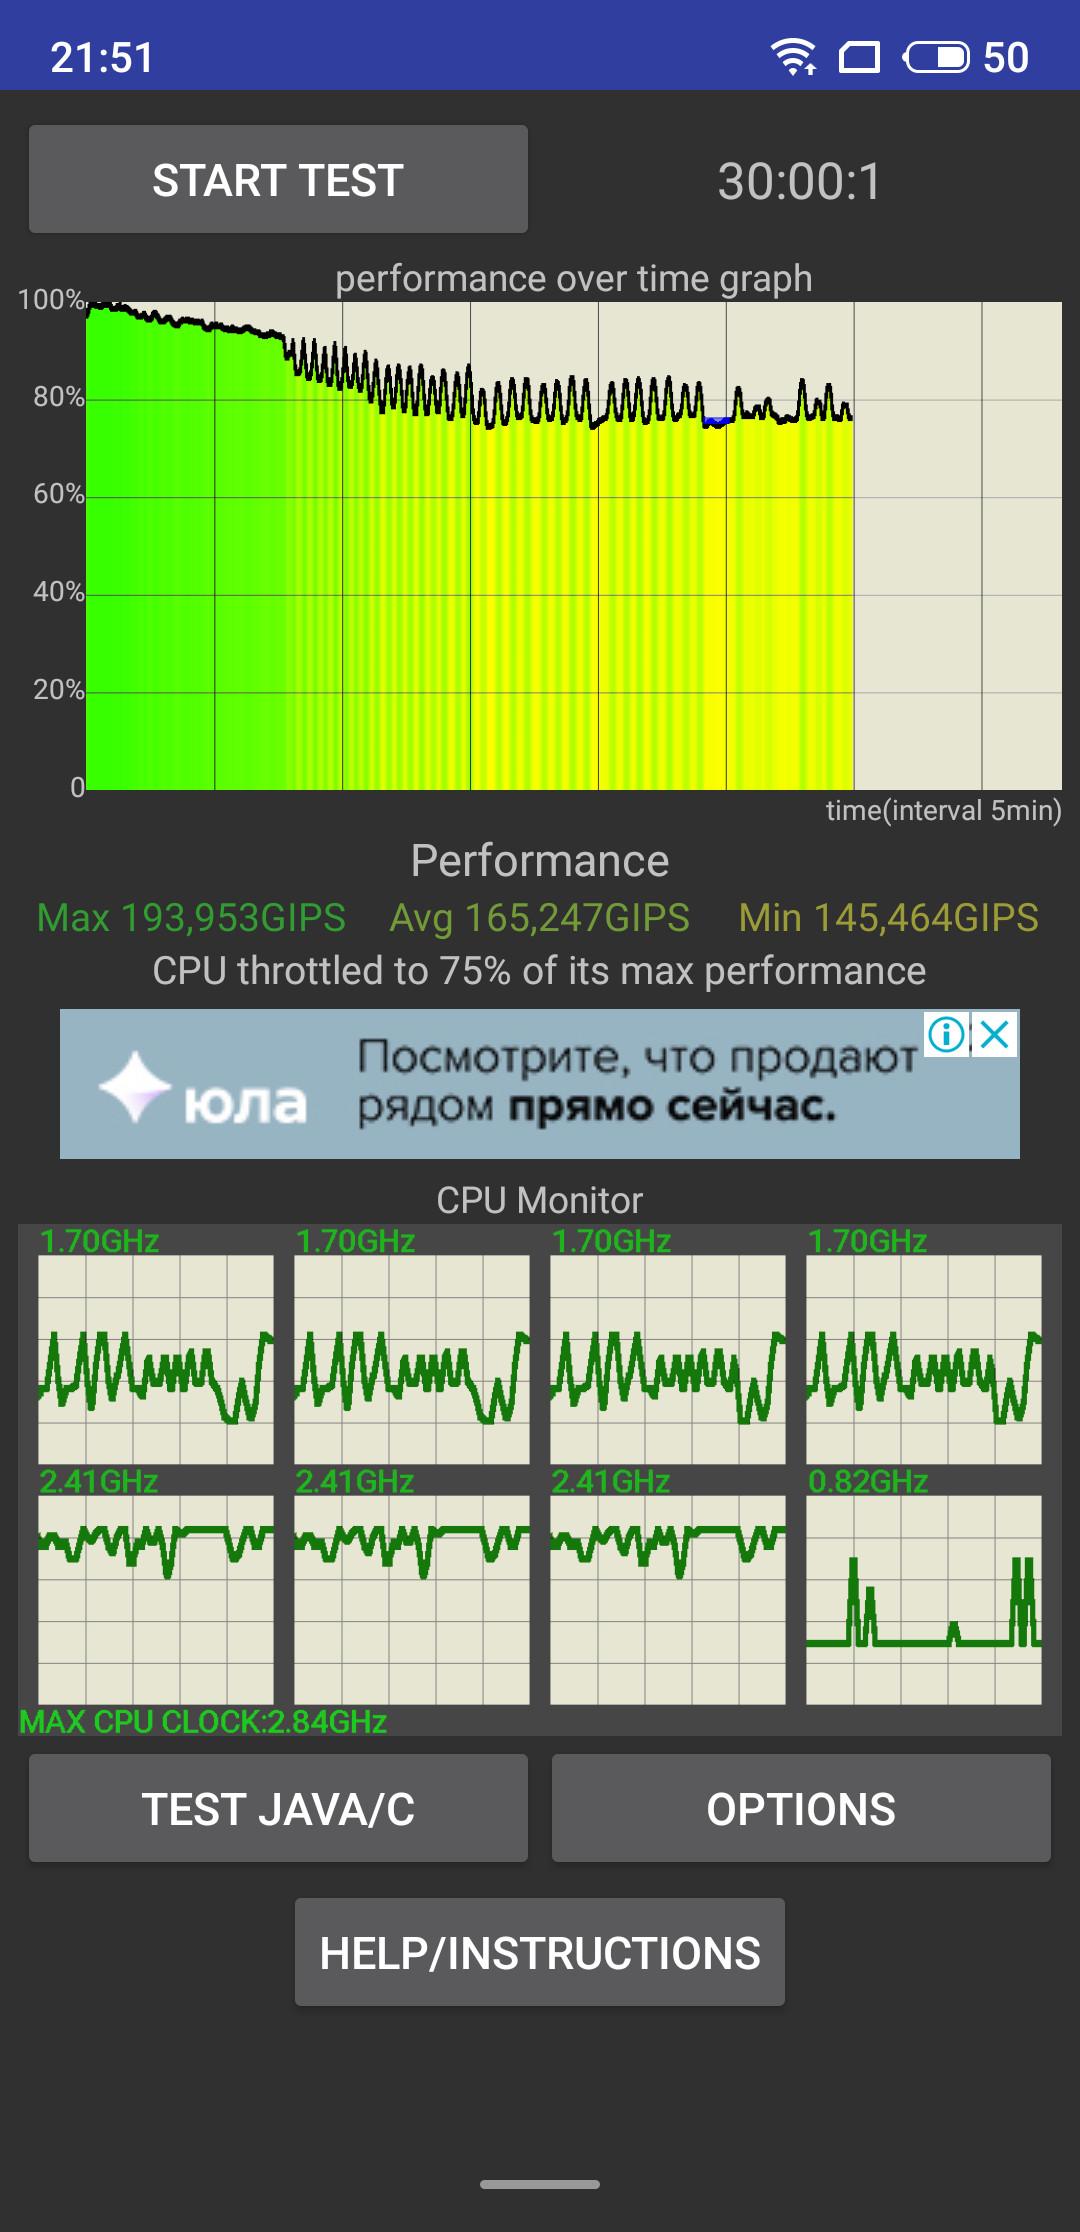 Обзор Meizu 16s: операционка Flyme OS с NFC Meizu  - obzor_meizu_16s_s_nfc_i_flyme_os_picture54_3